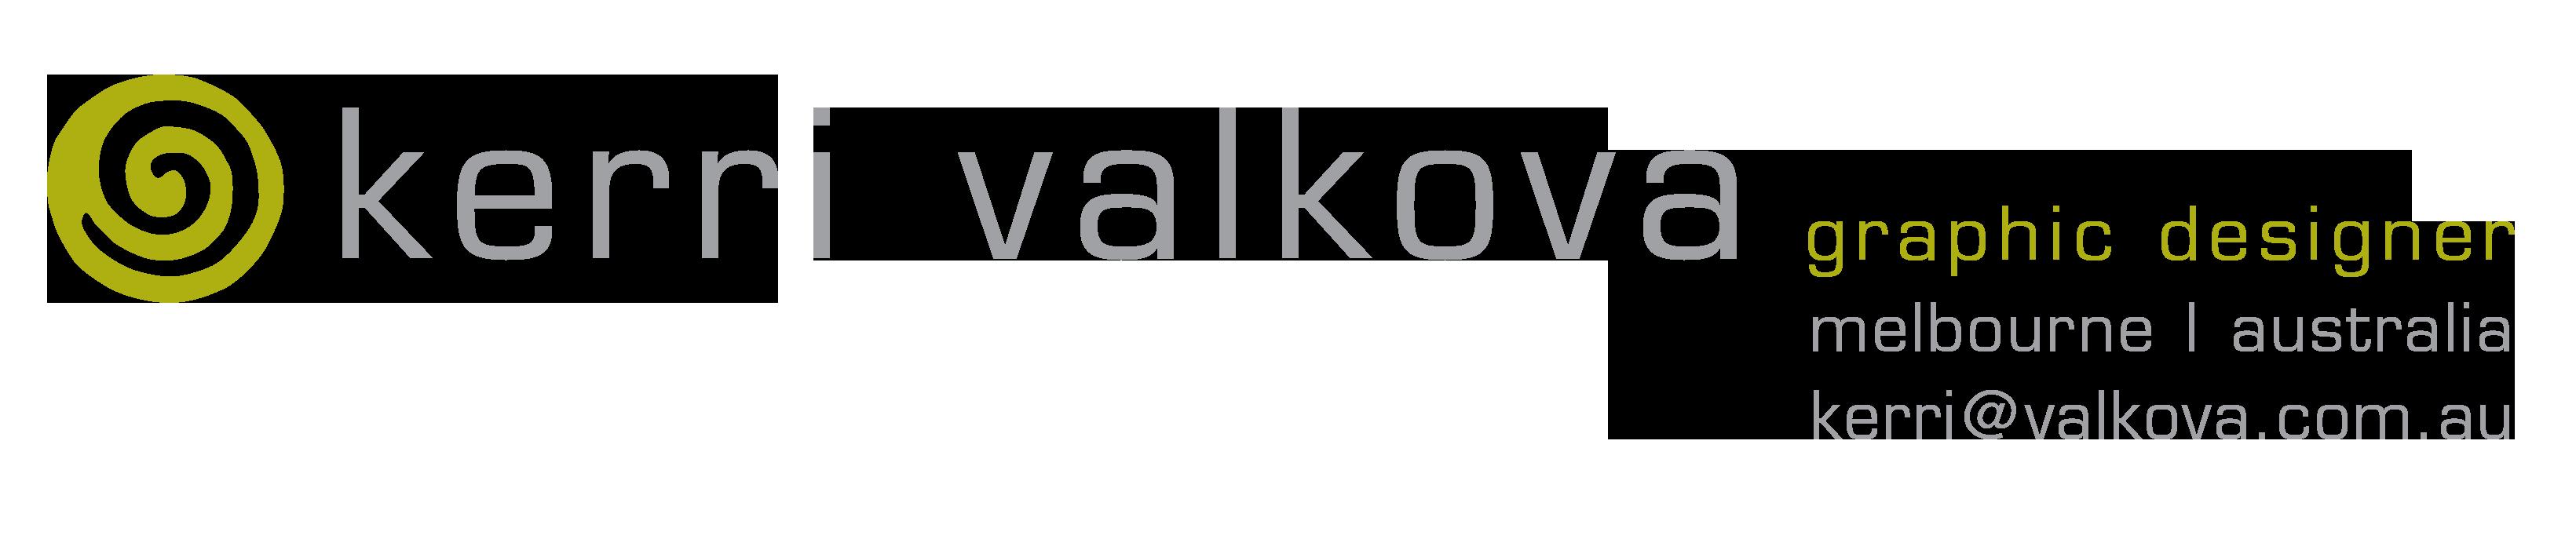 logo banner high res